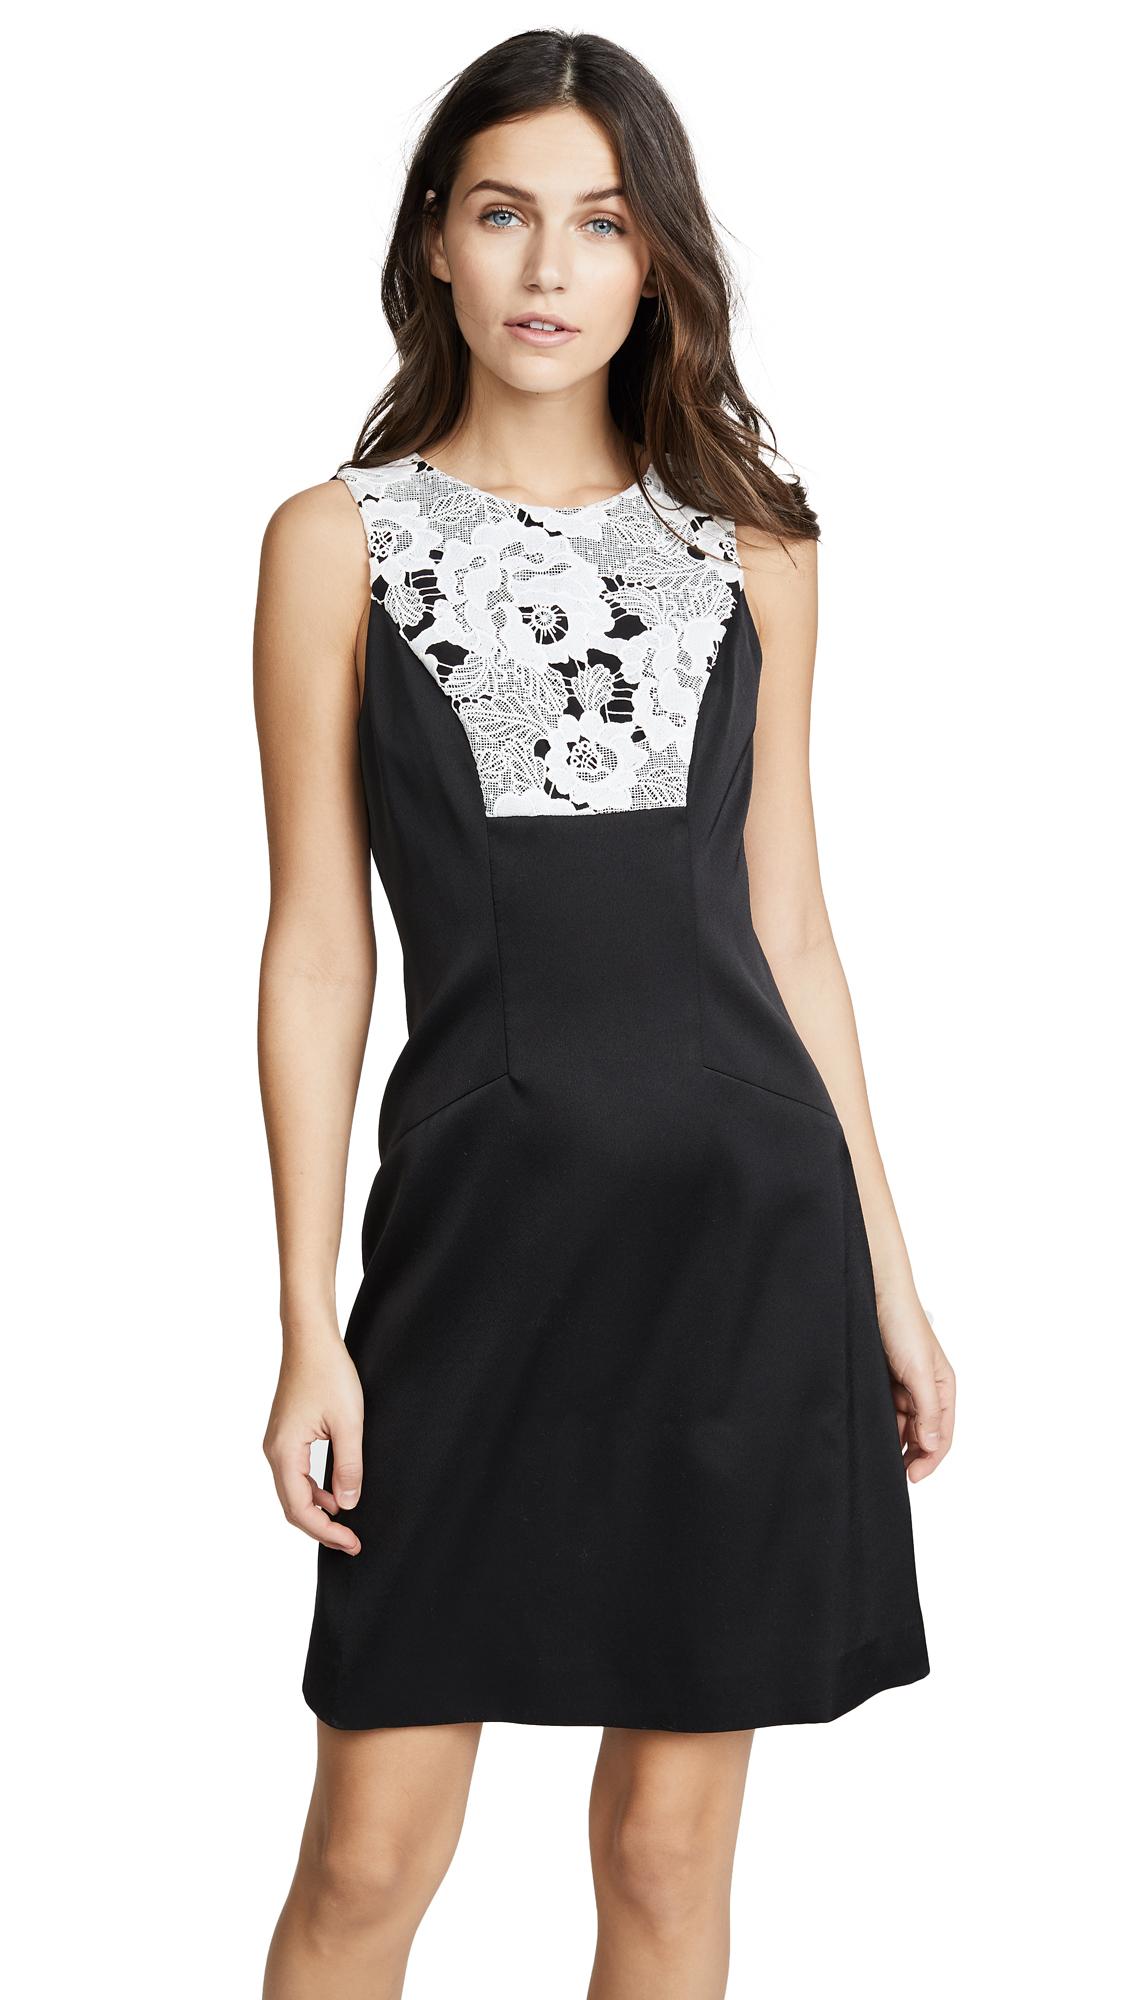 Prabal Gurung Shift Dress - Black/White